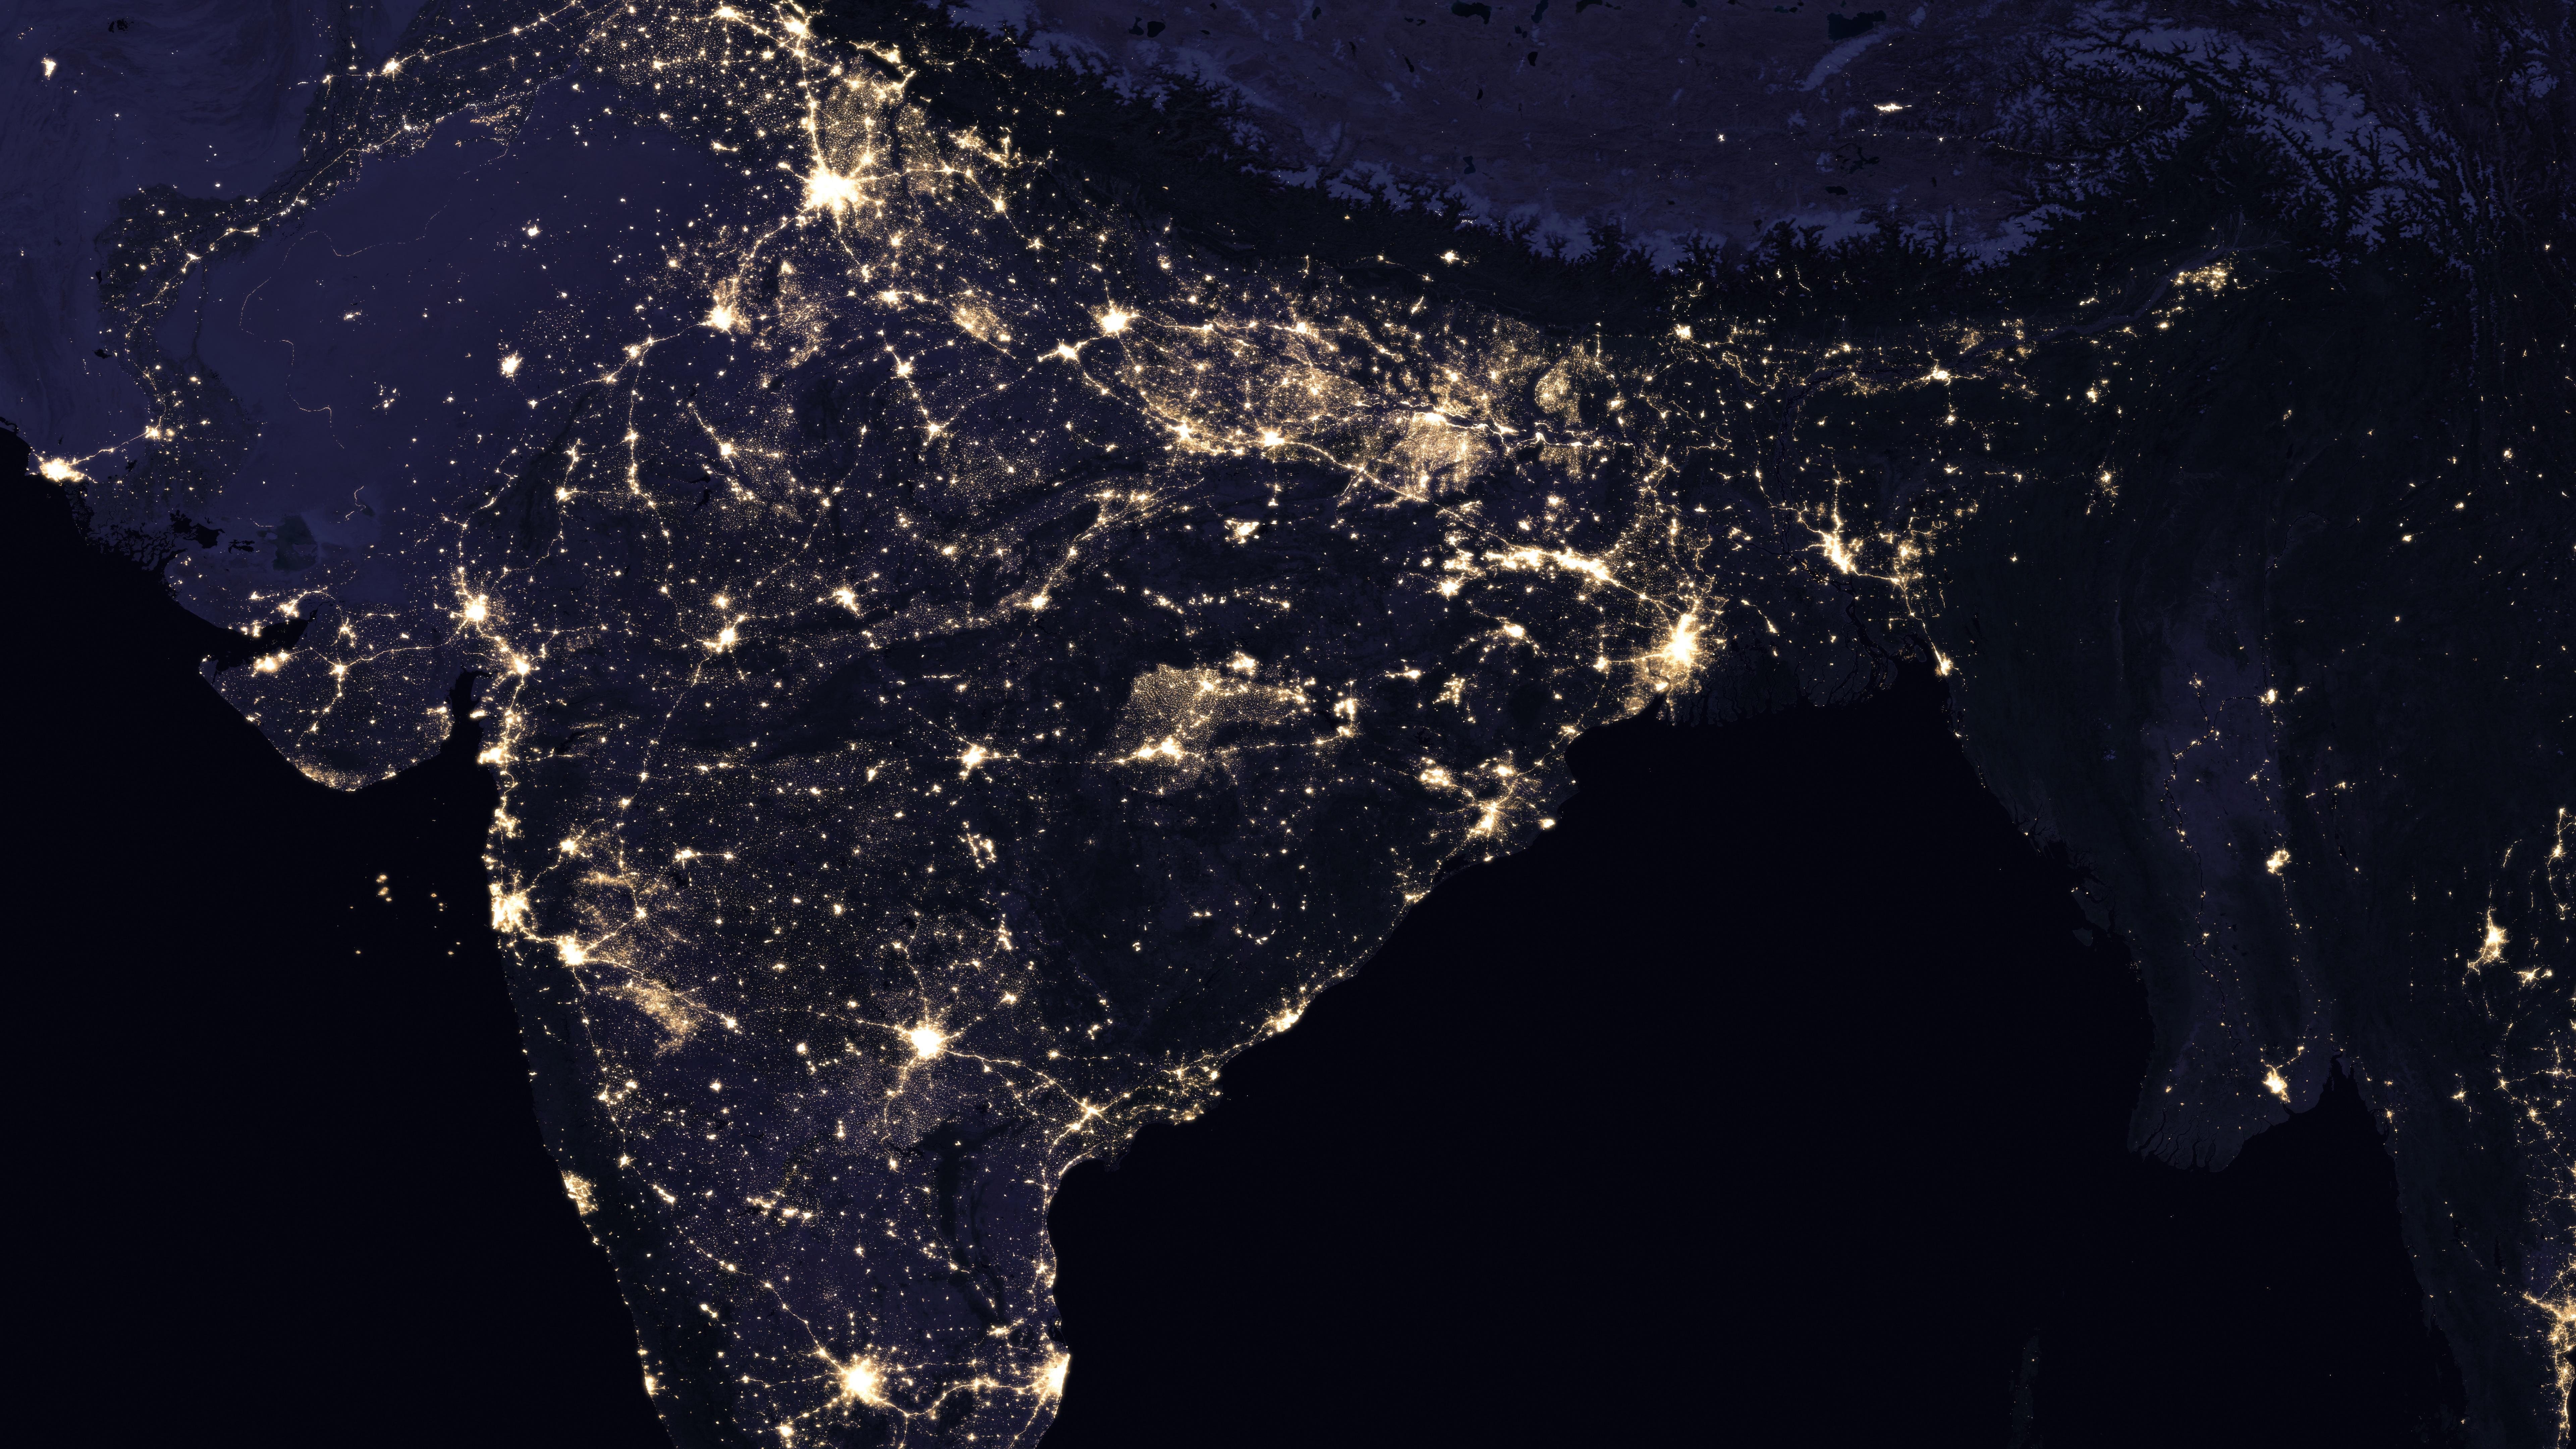 Night Lights of India 2016 wallpaper